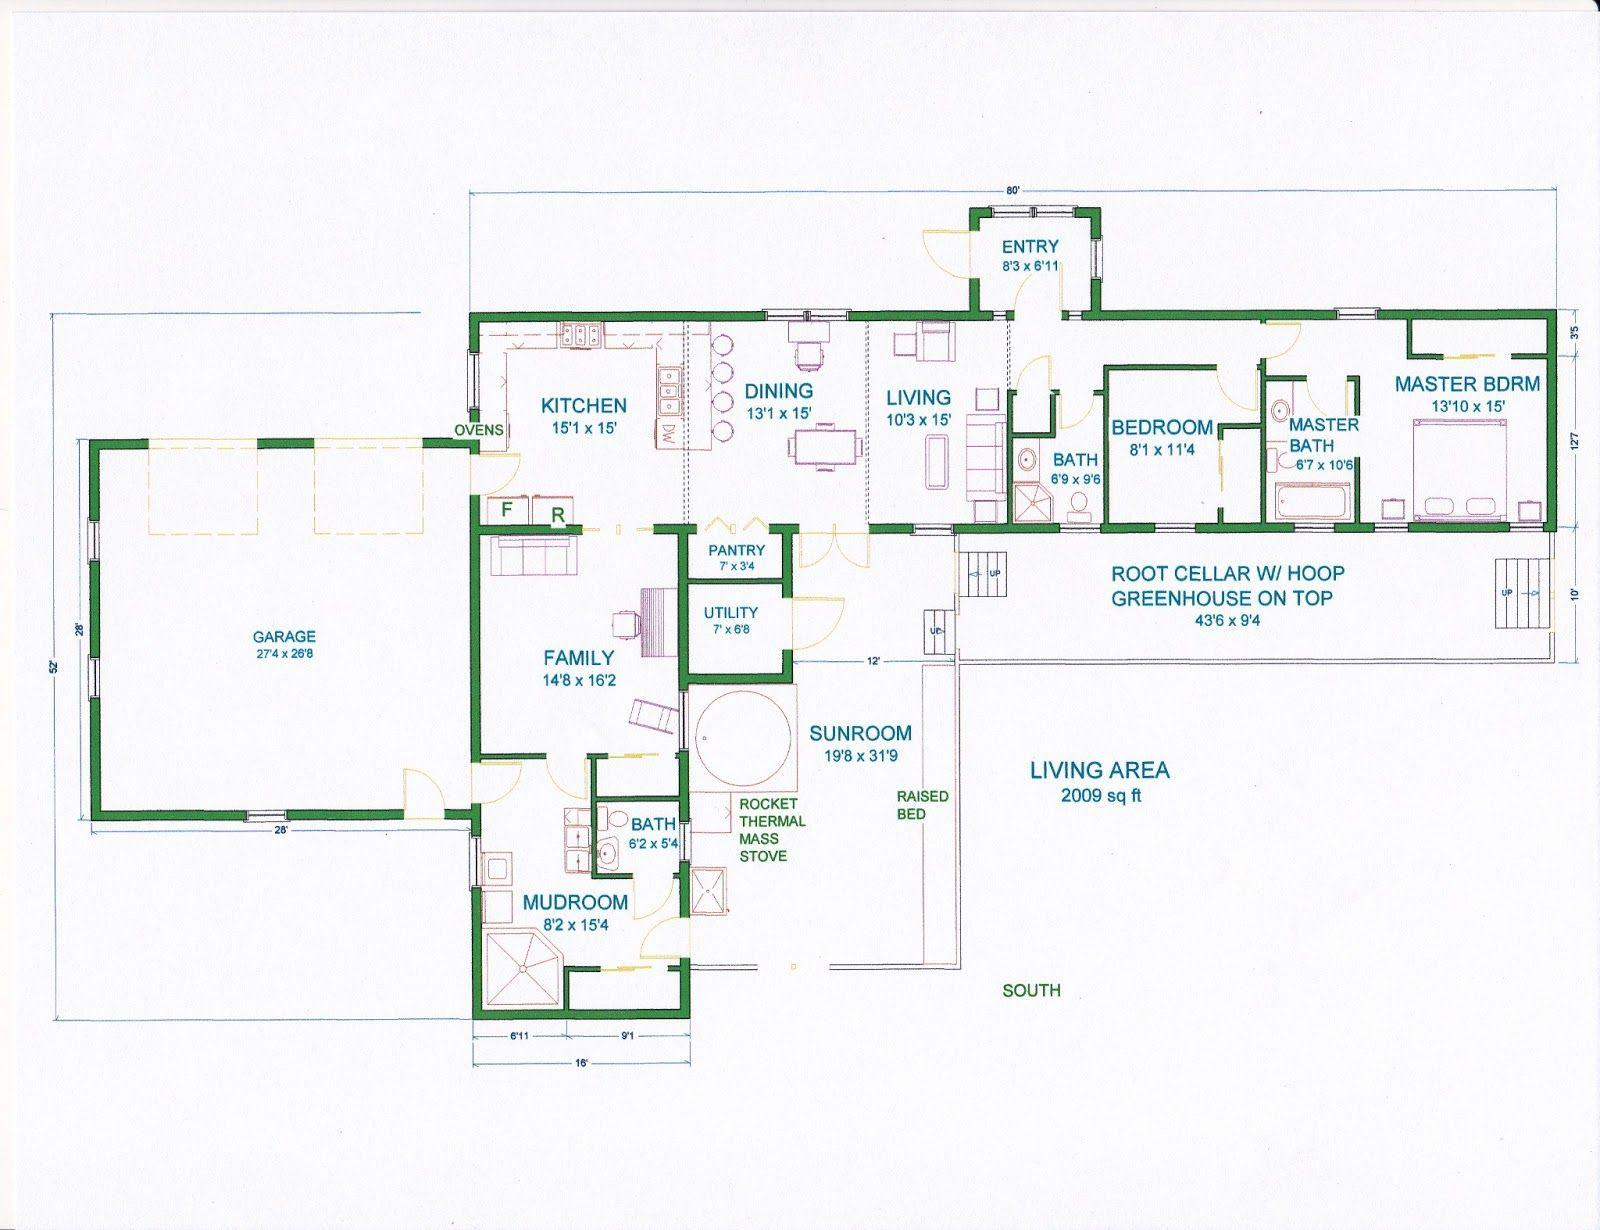 grama sue's floor plan play land: passive solar - off grid l